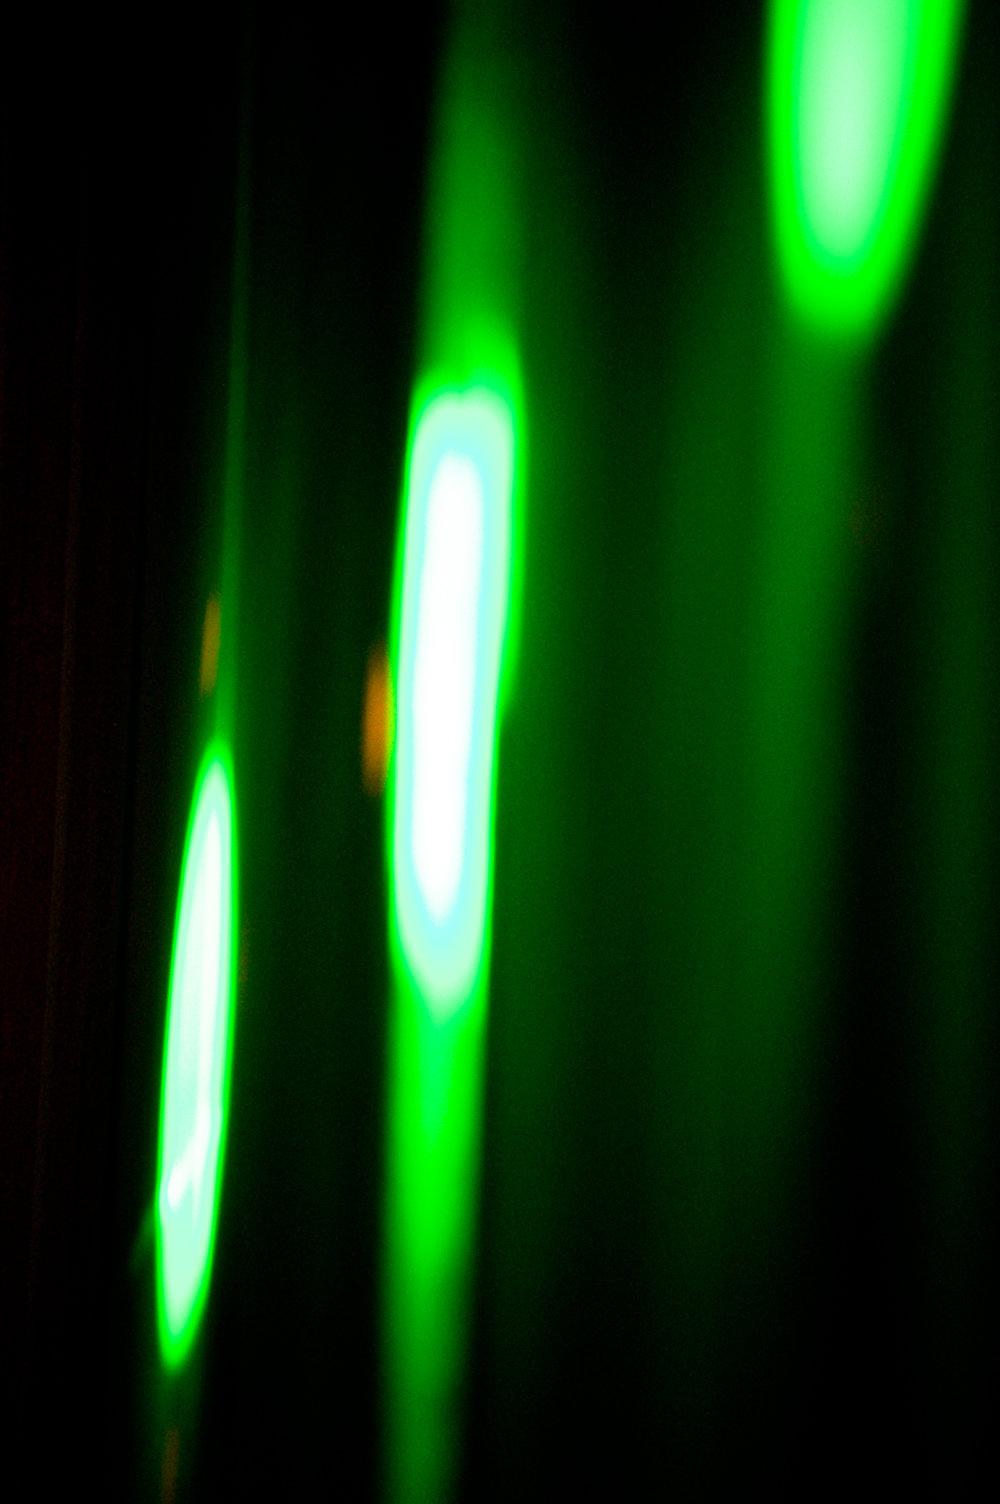 green_orbs_2.jpg